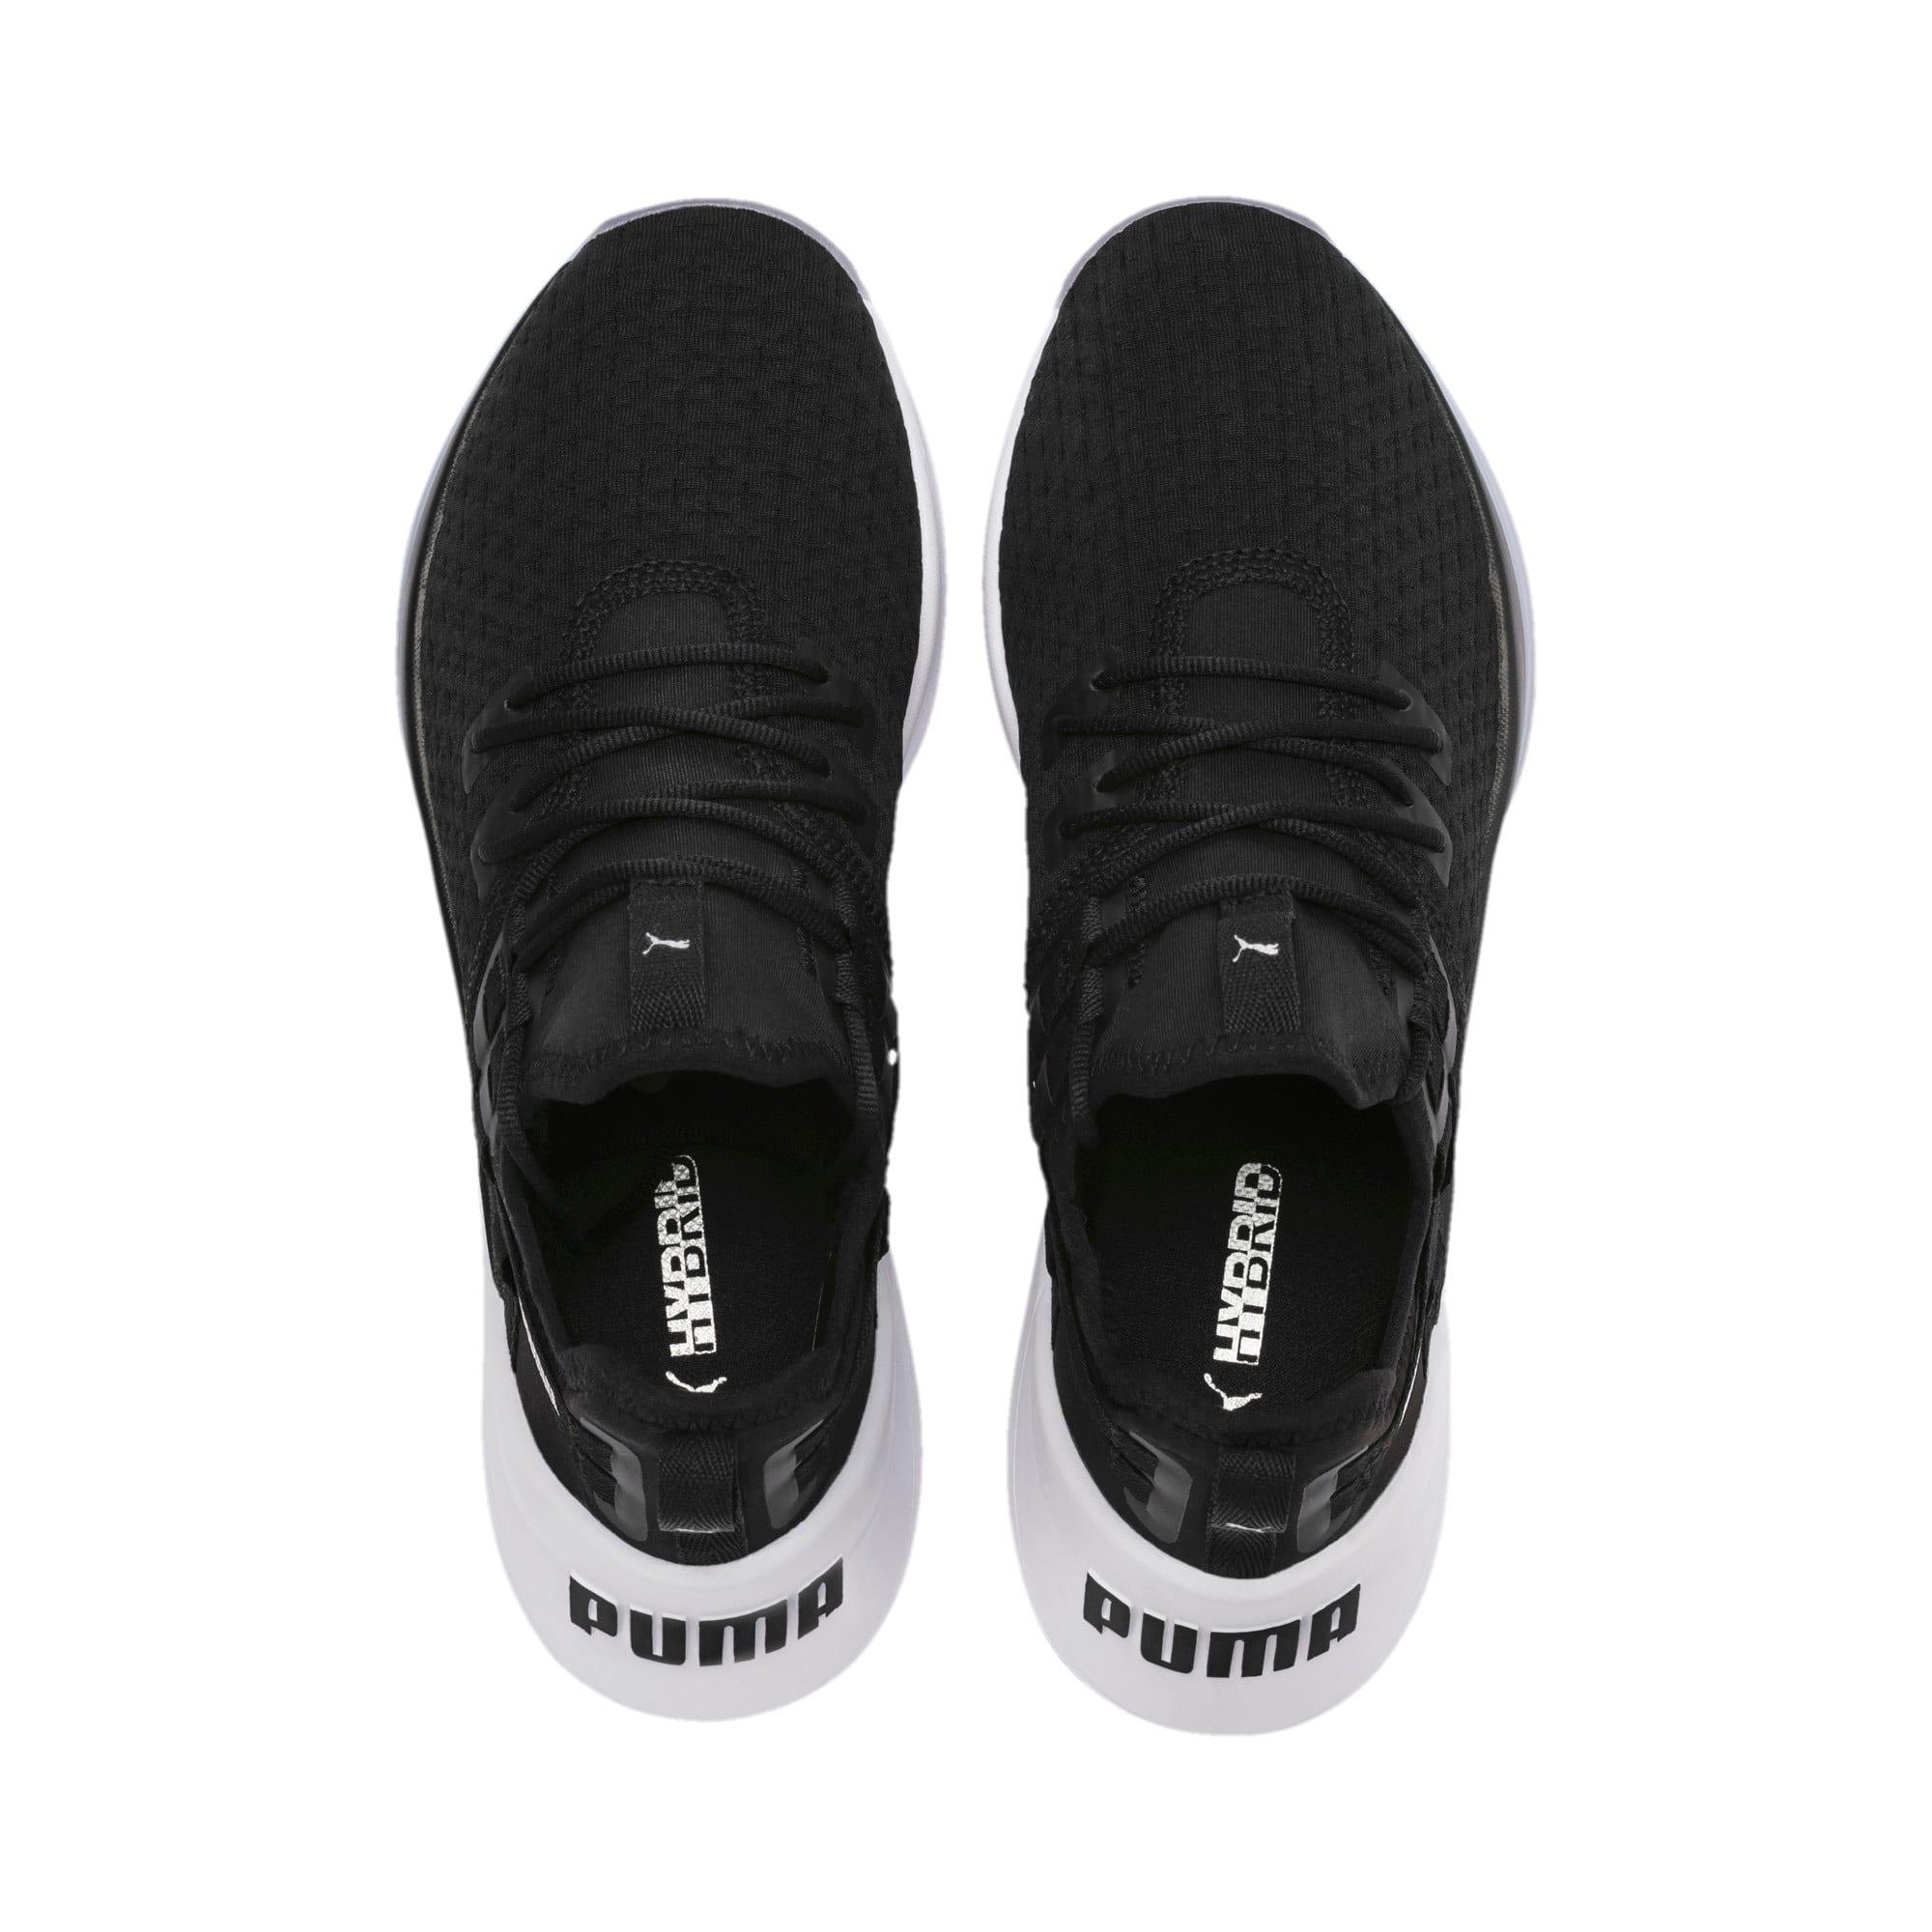 Thumbnail 6 of Jaab XT Women's Training Shoes, Puma Black-Puma White, medium